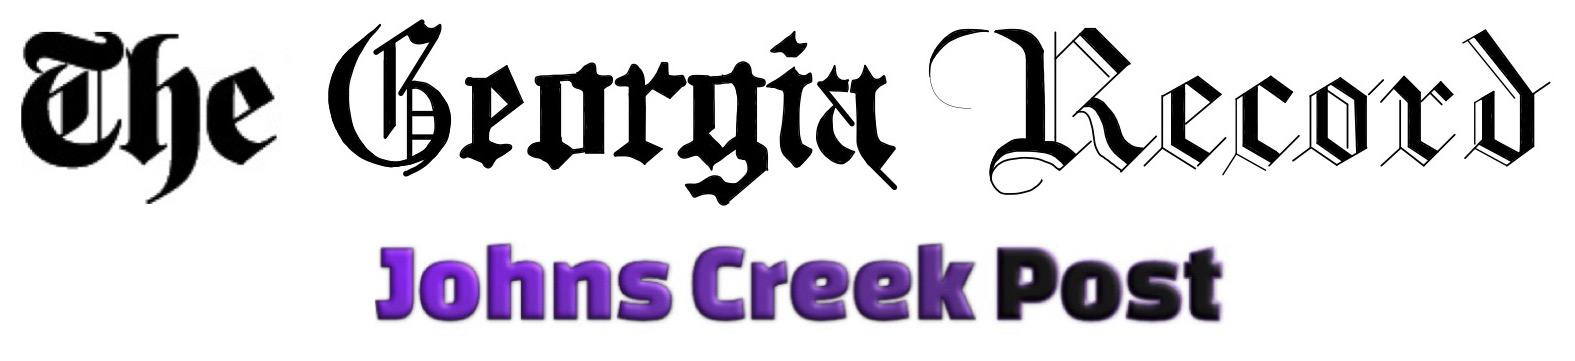 The Georgia Record/Johns Creek Post